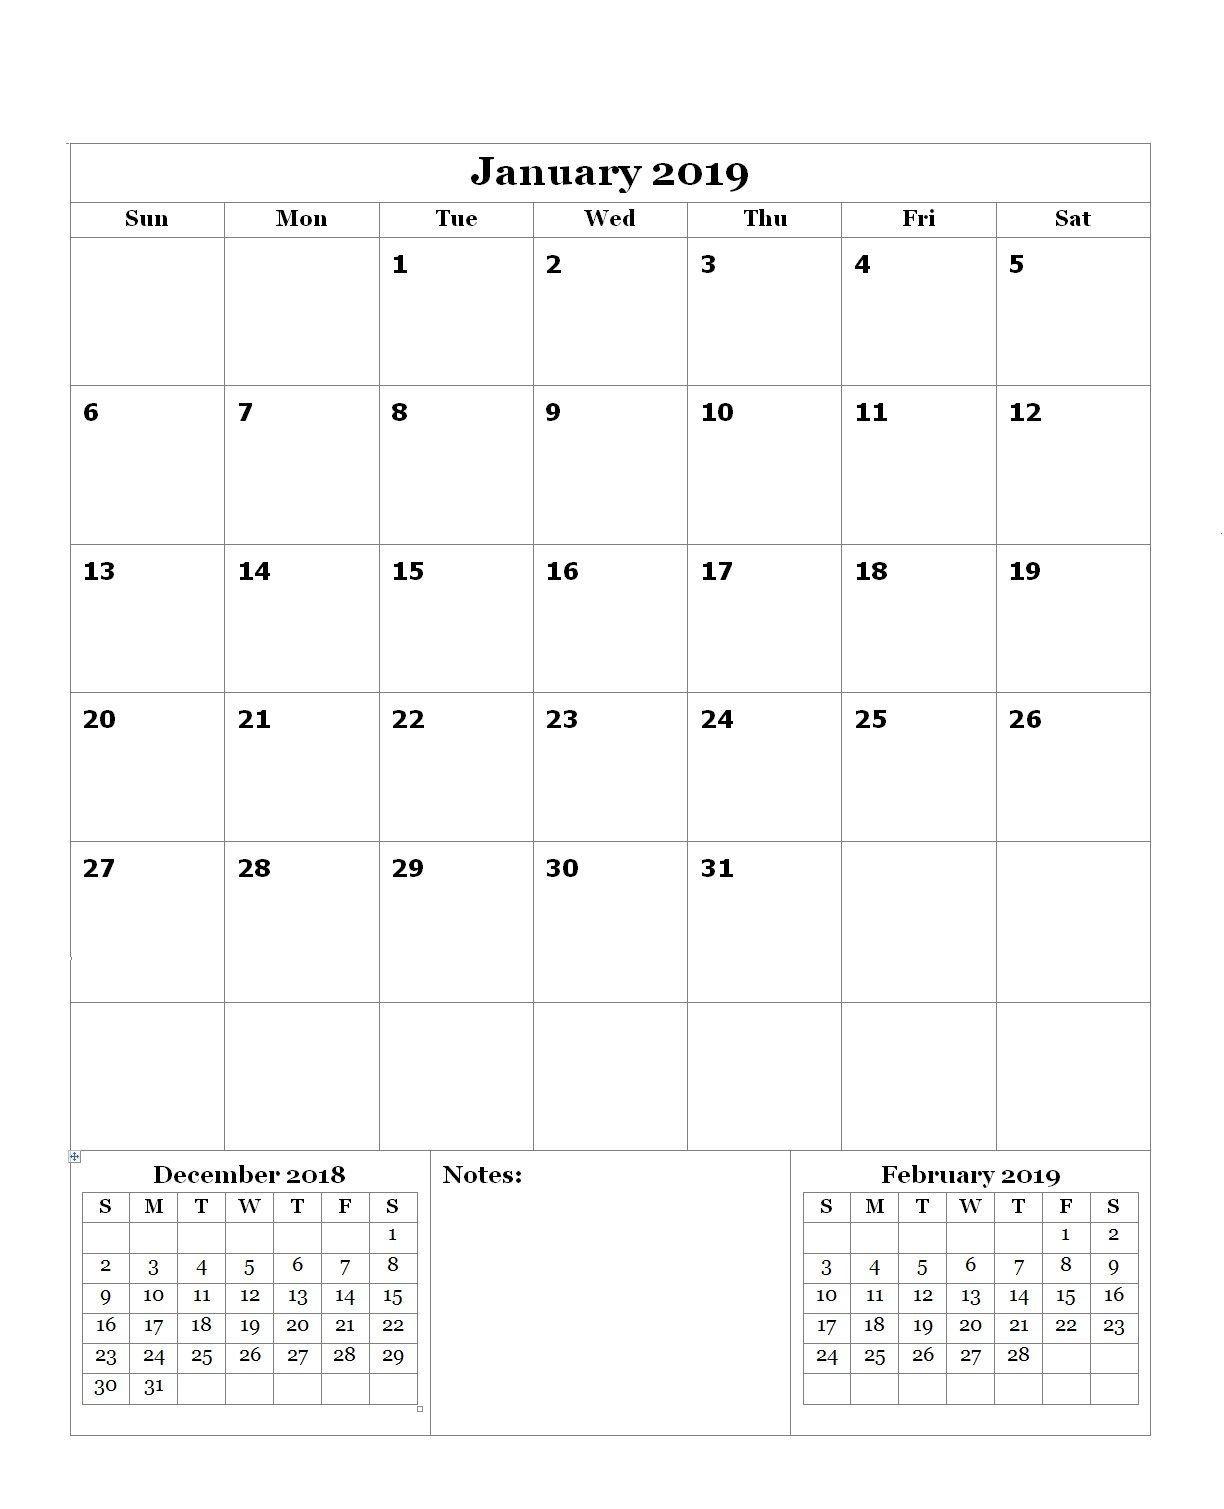 Free Online Calander I Can Edit | Get Your Calendar Printable Blank Calendar I Can Edit